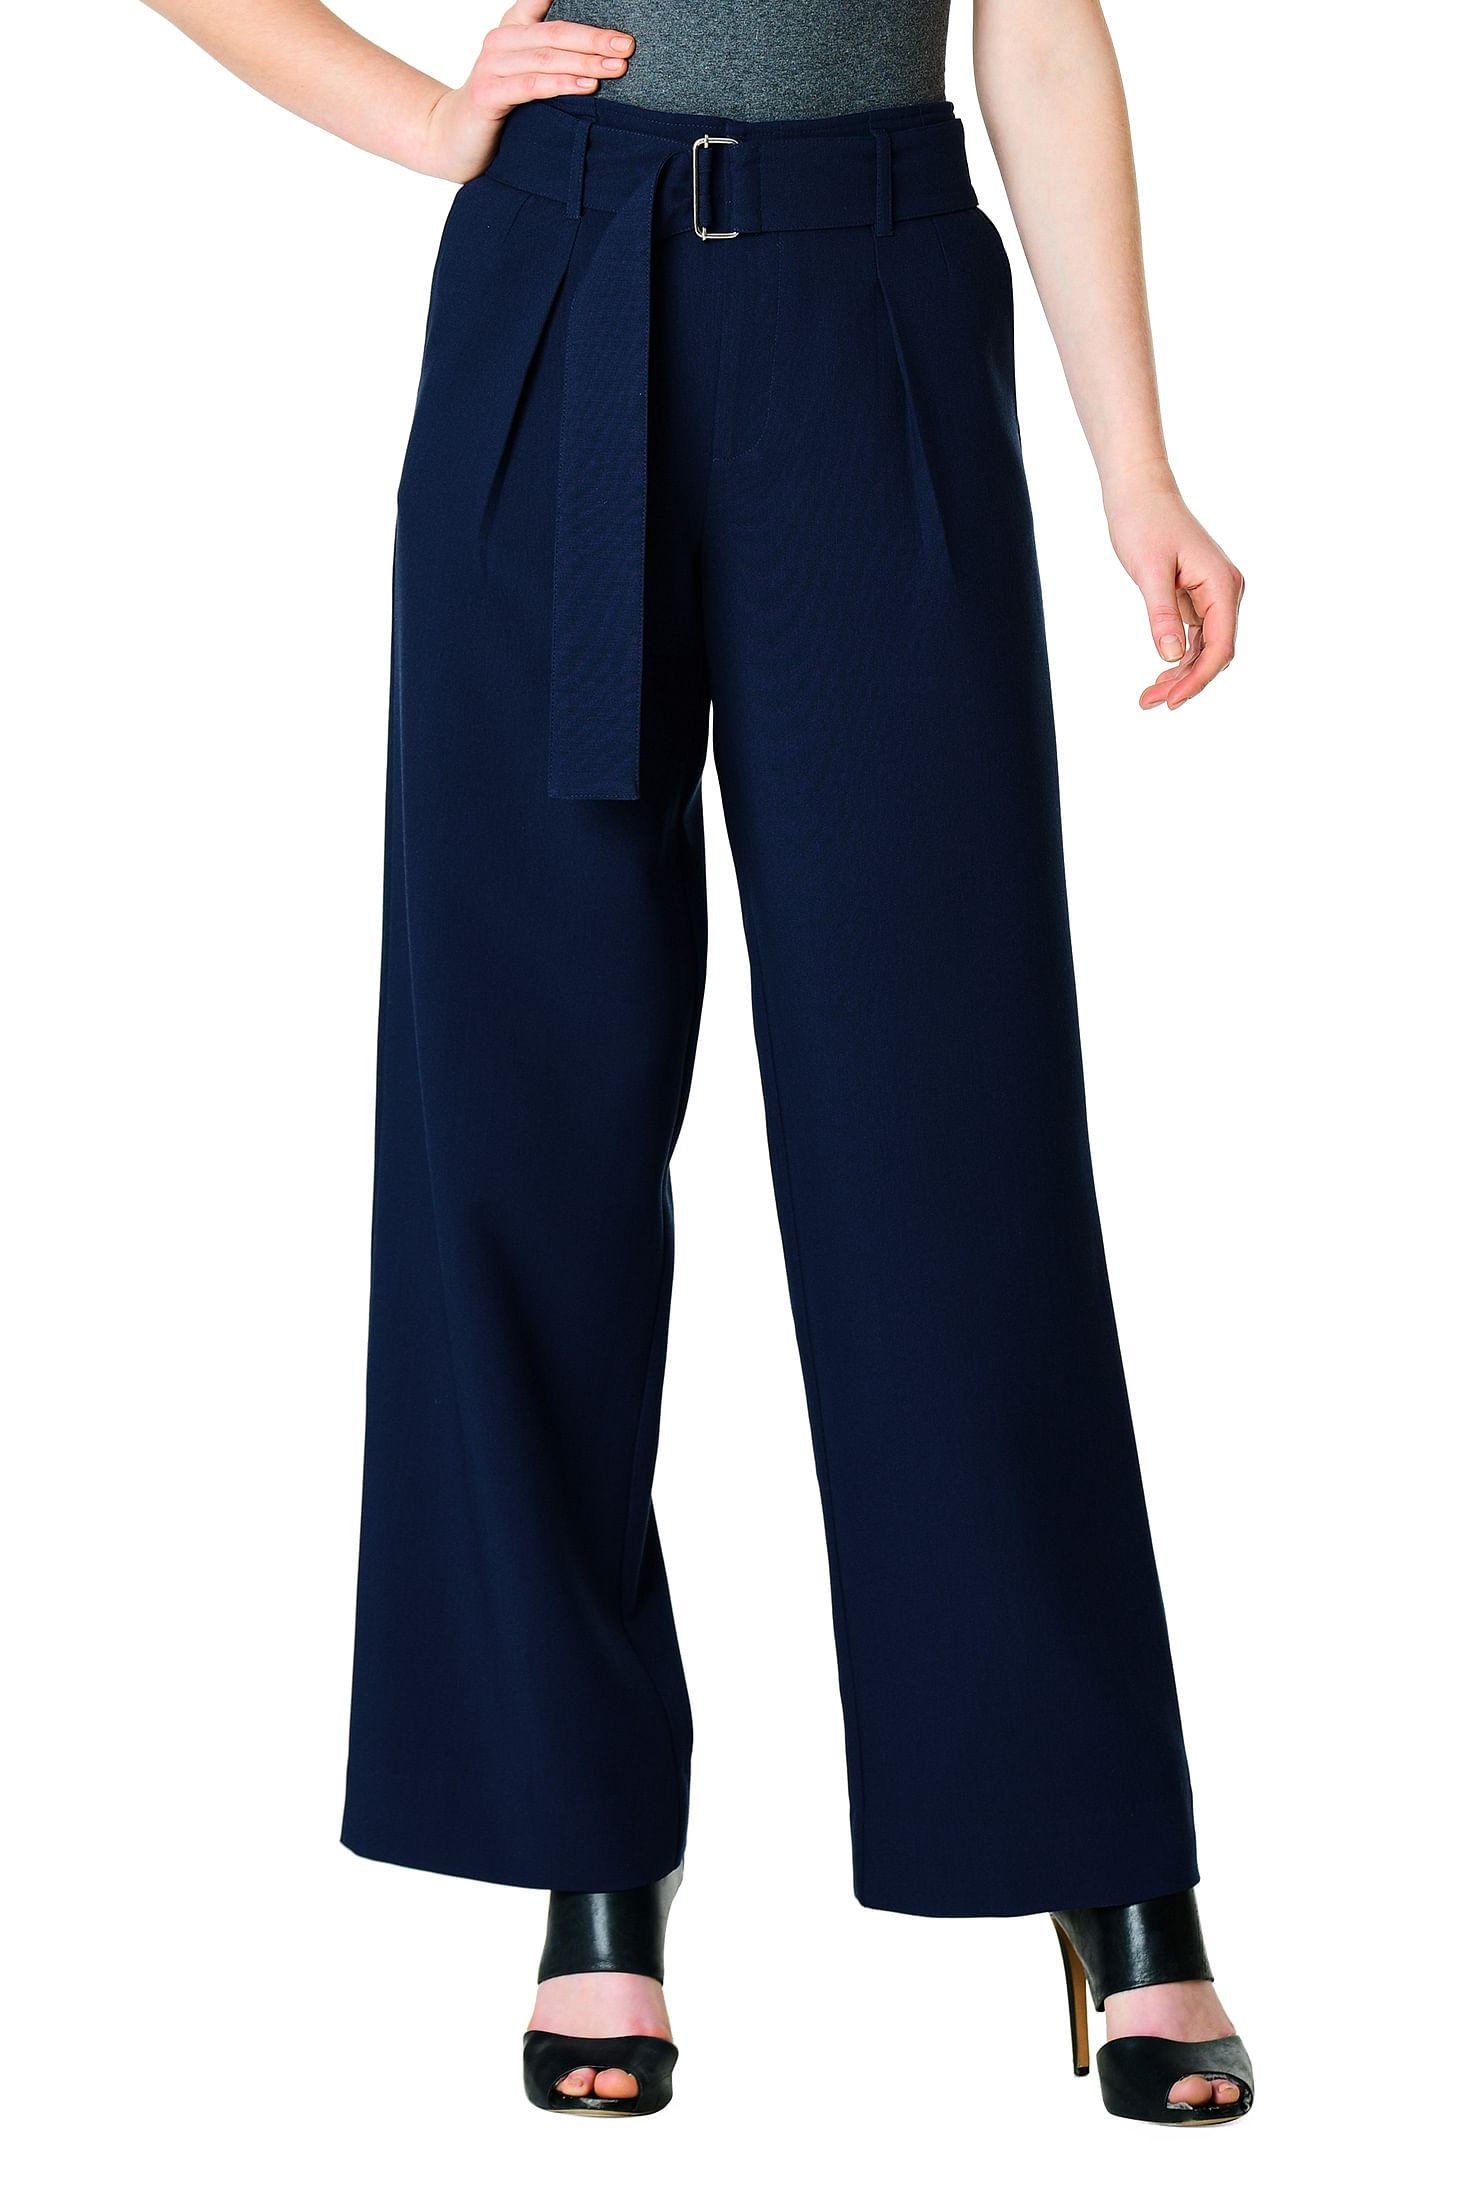 59c2486aeca25 front pleat pants, full-length pants, high waist pants, high-